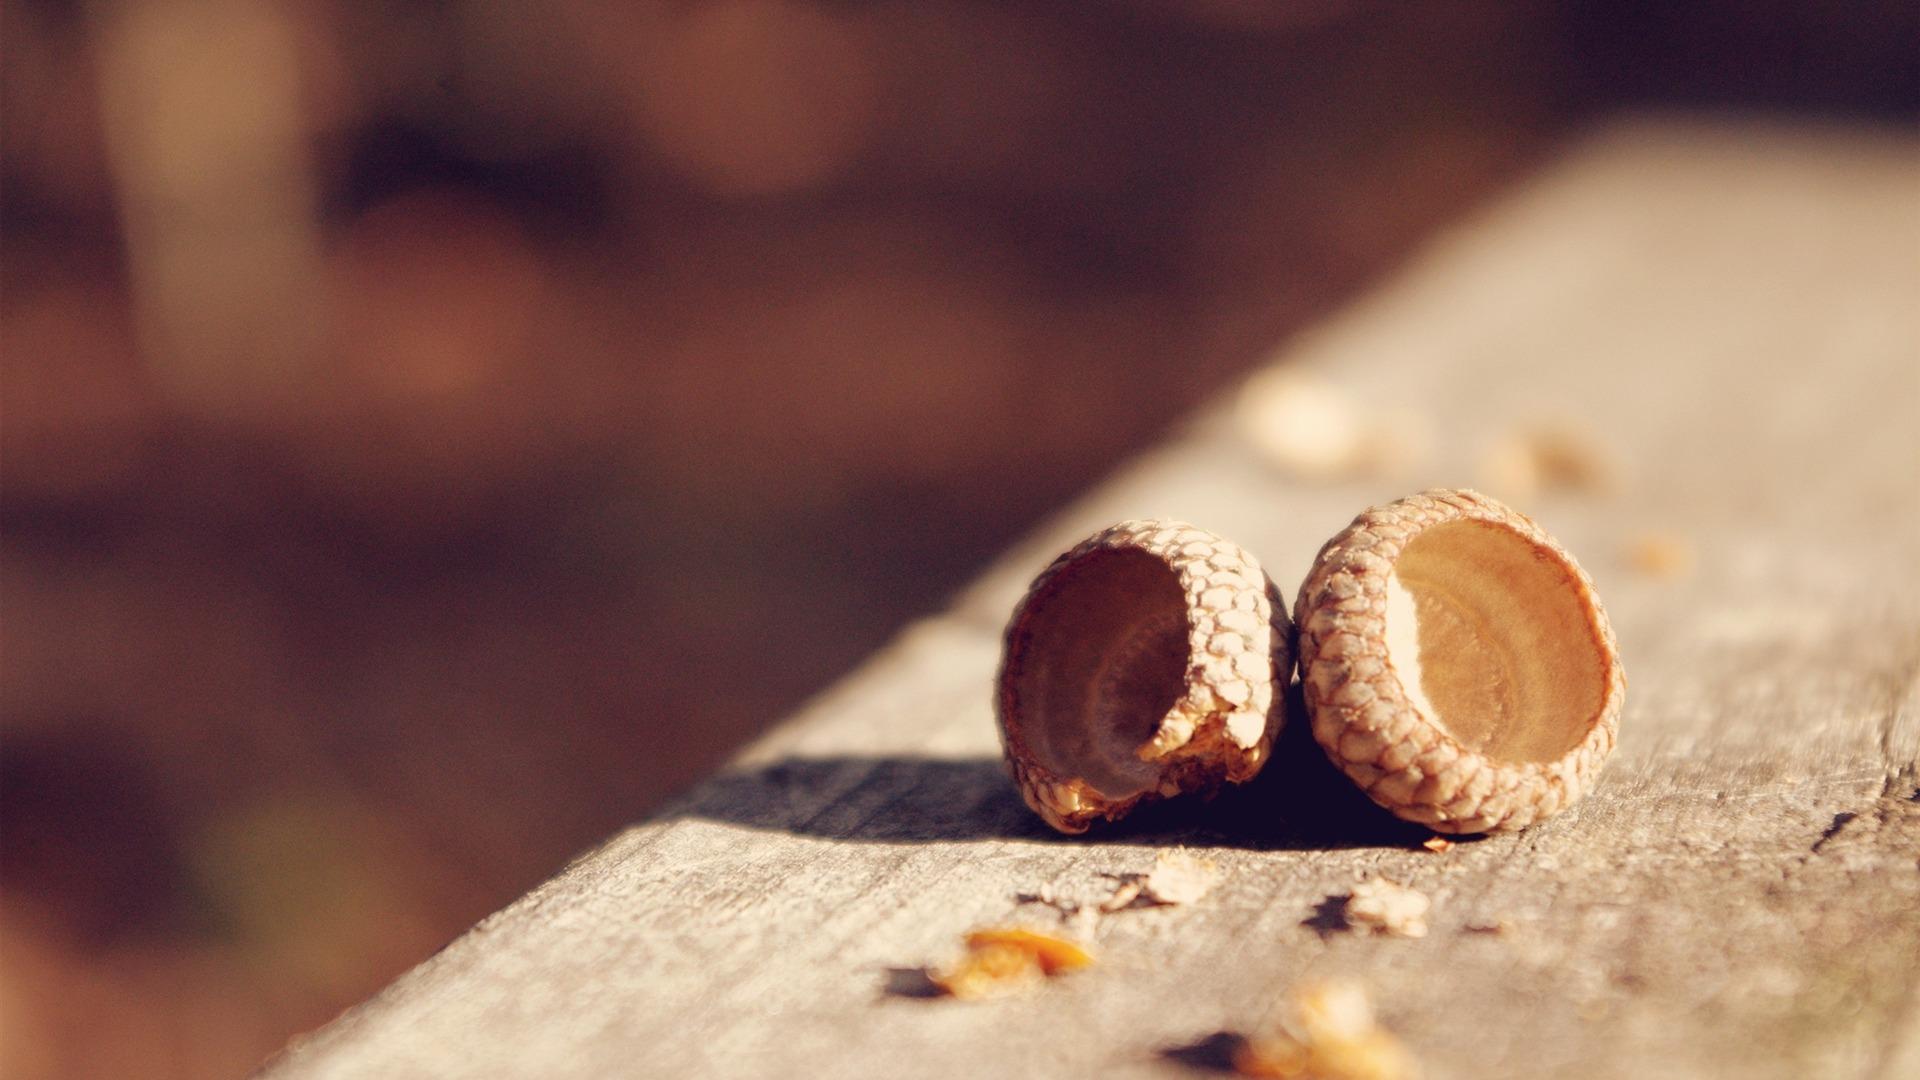 acorn wallpaper 23363